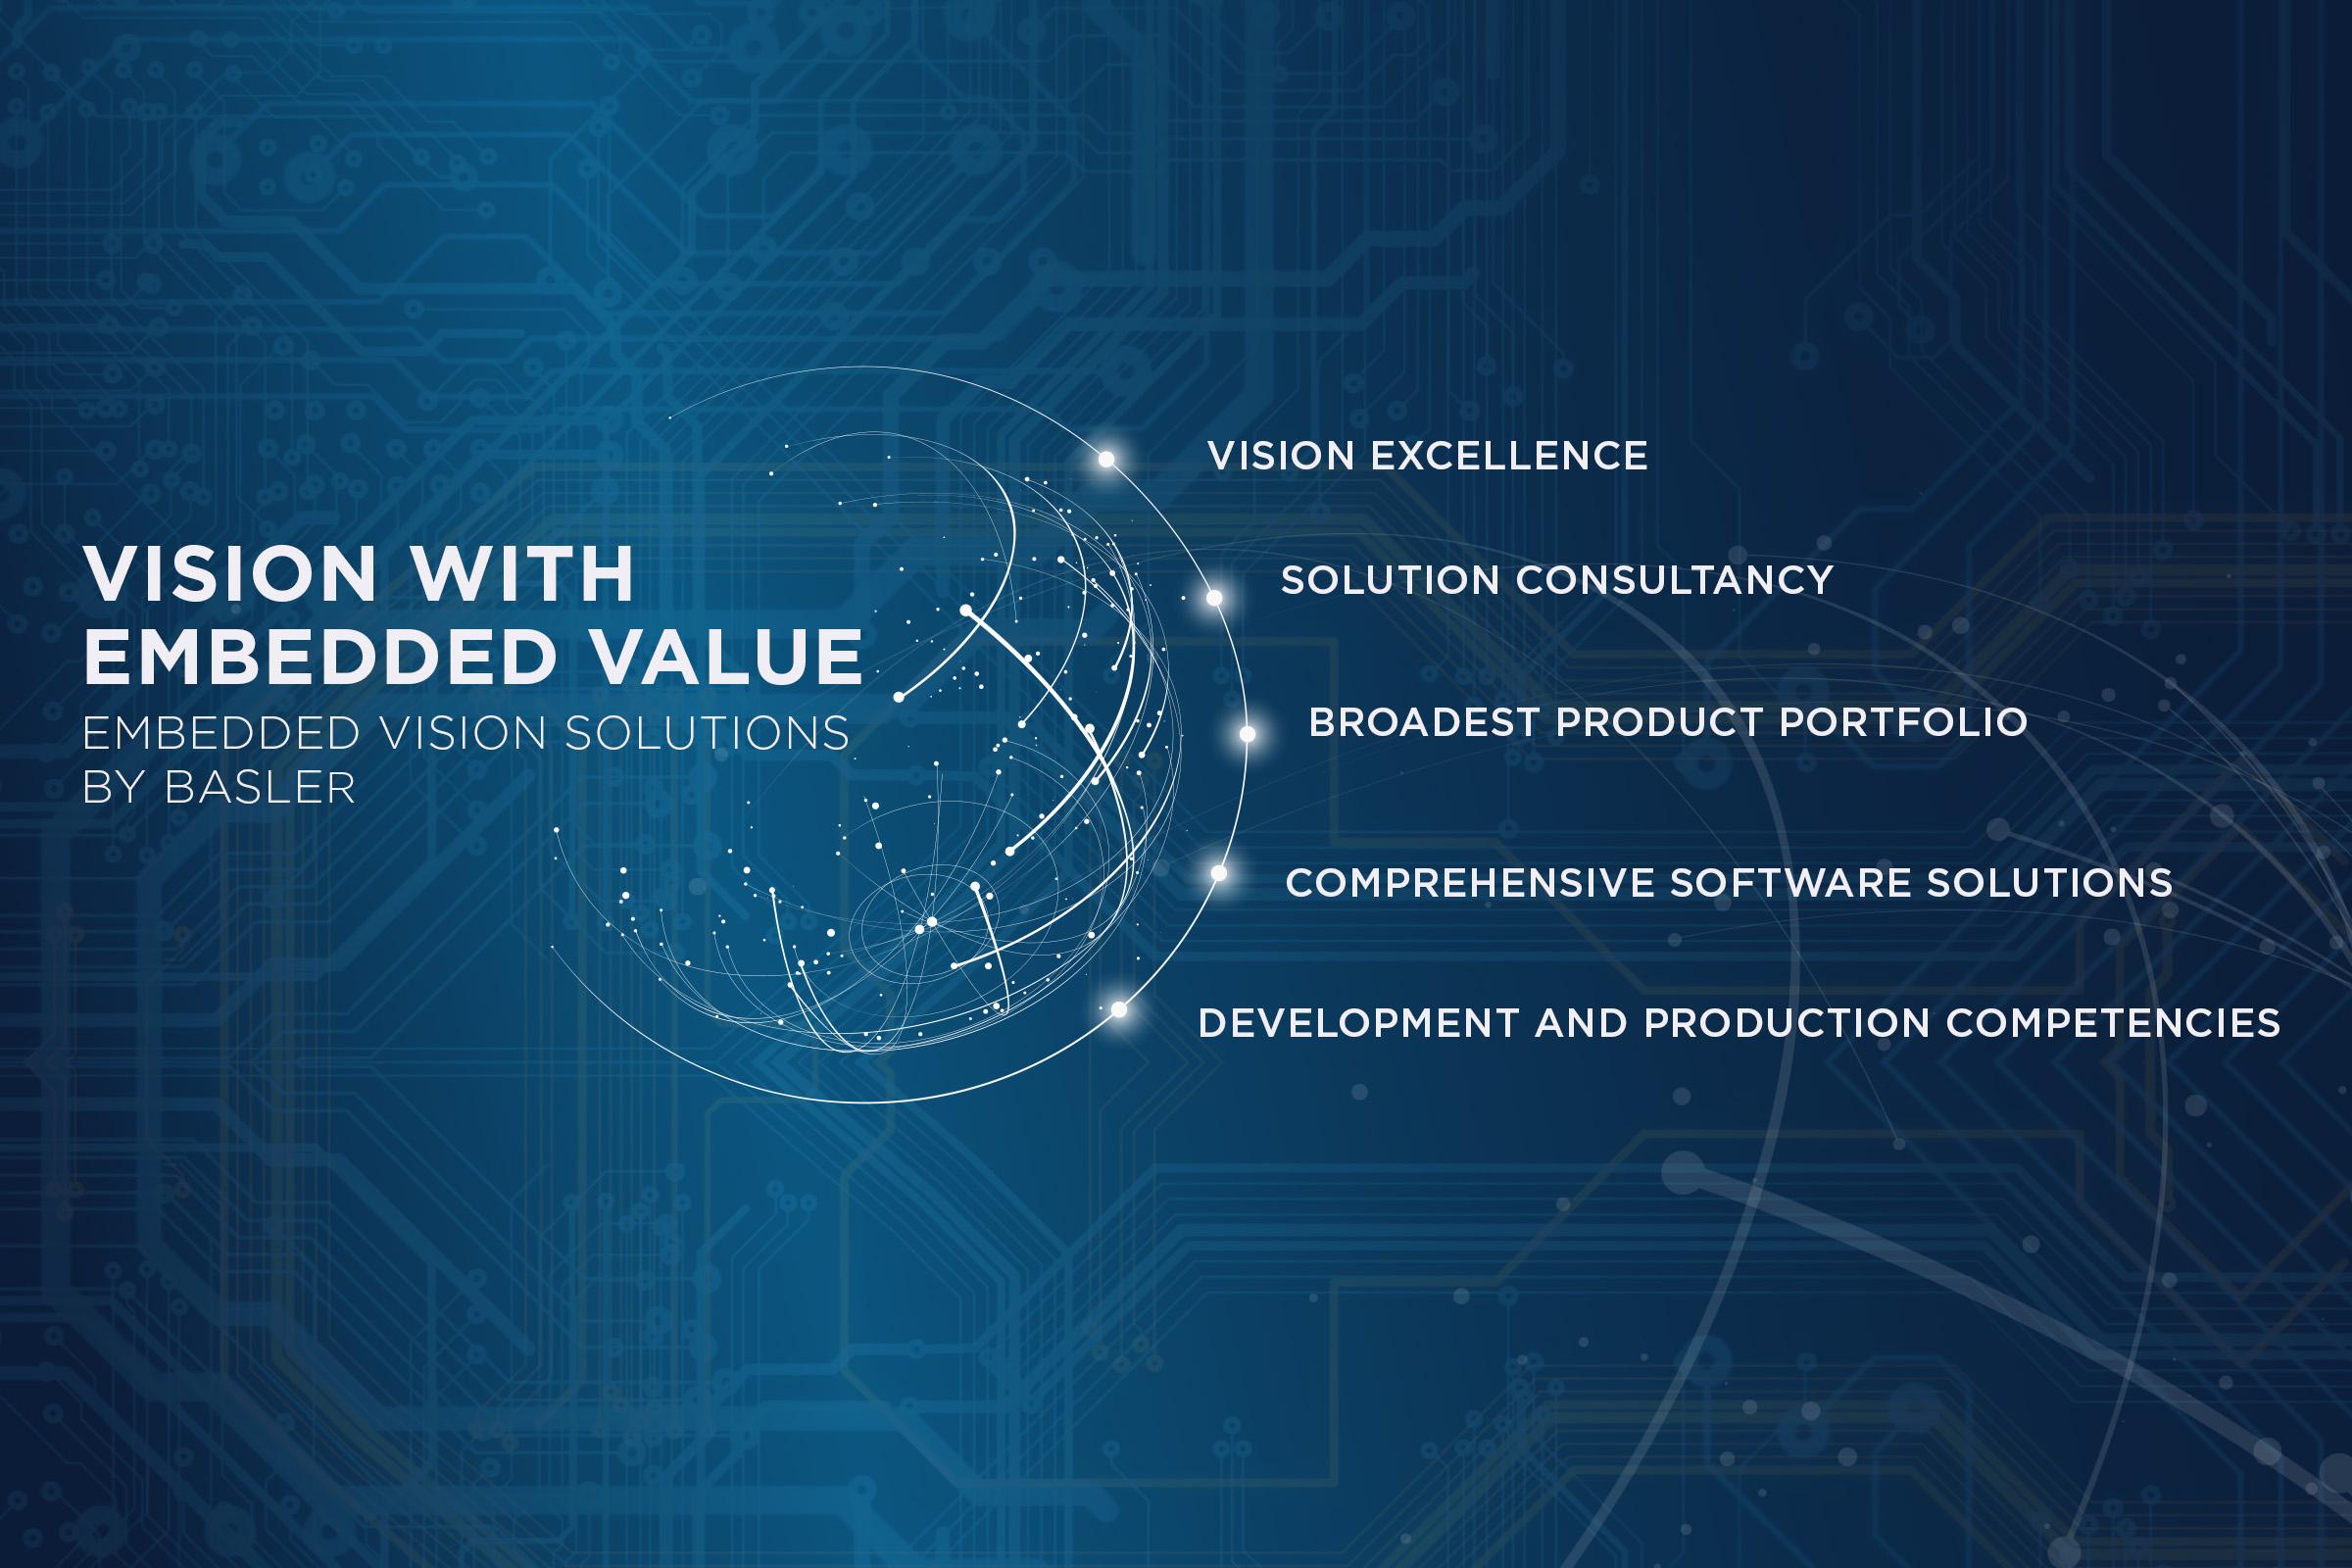 BAS1902_PR_Basler-Expands_Embedded_Vision_Portfolio_rgb